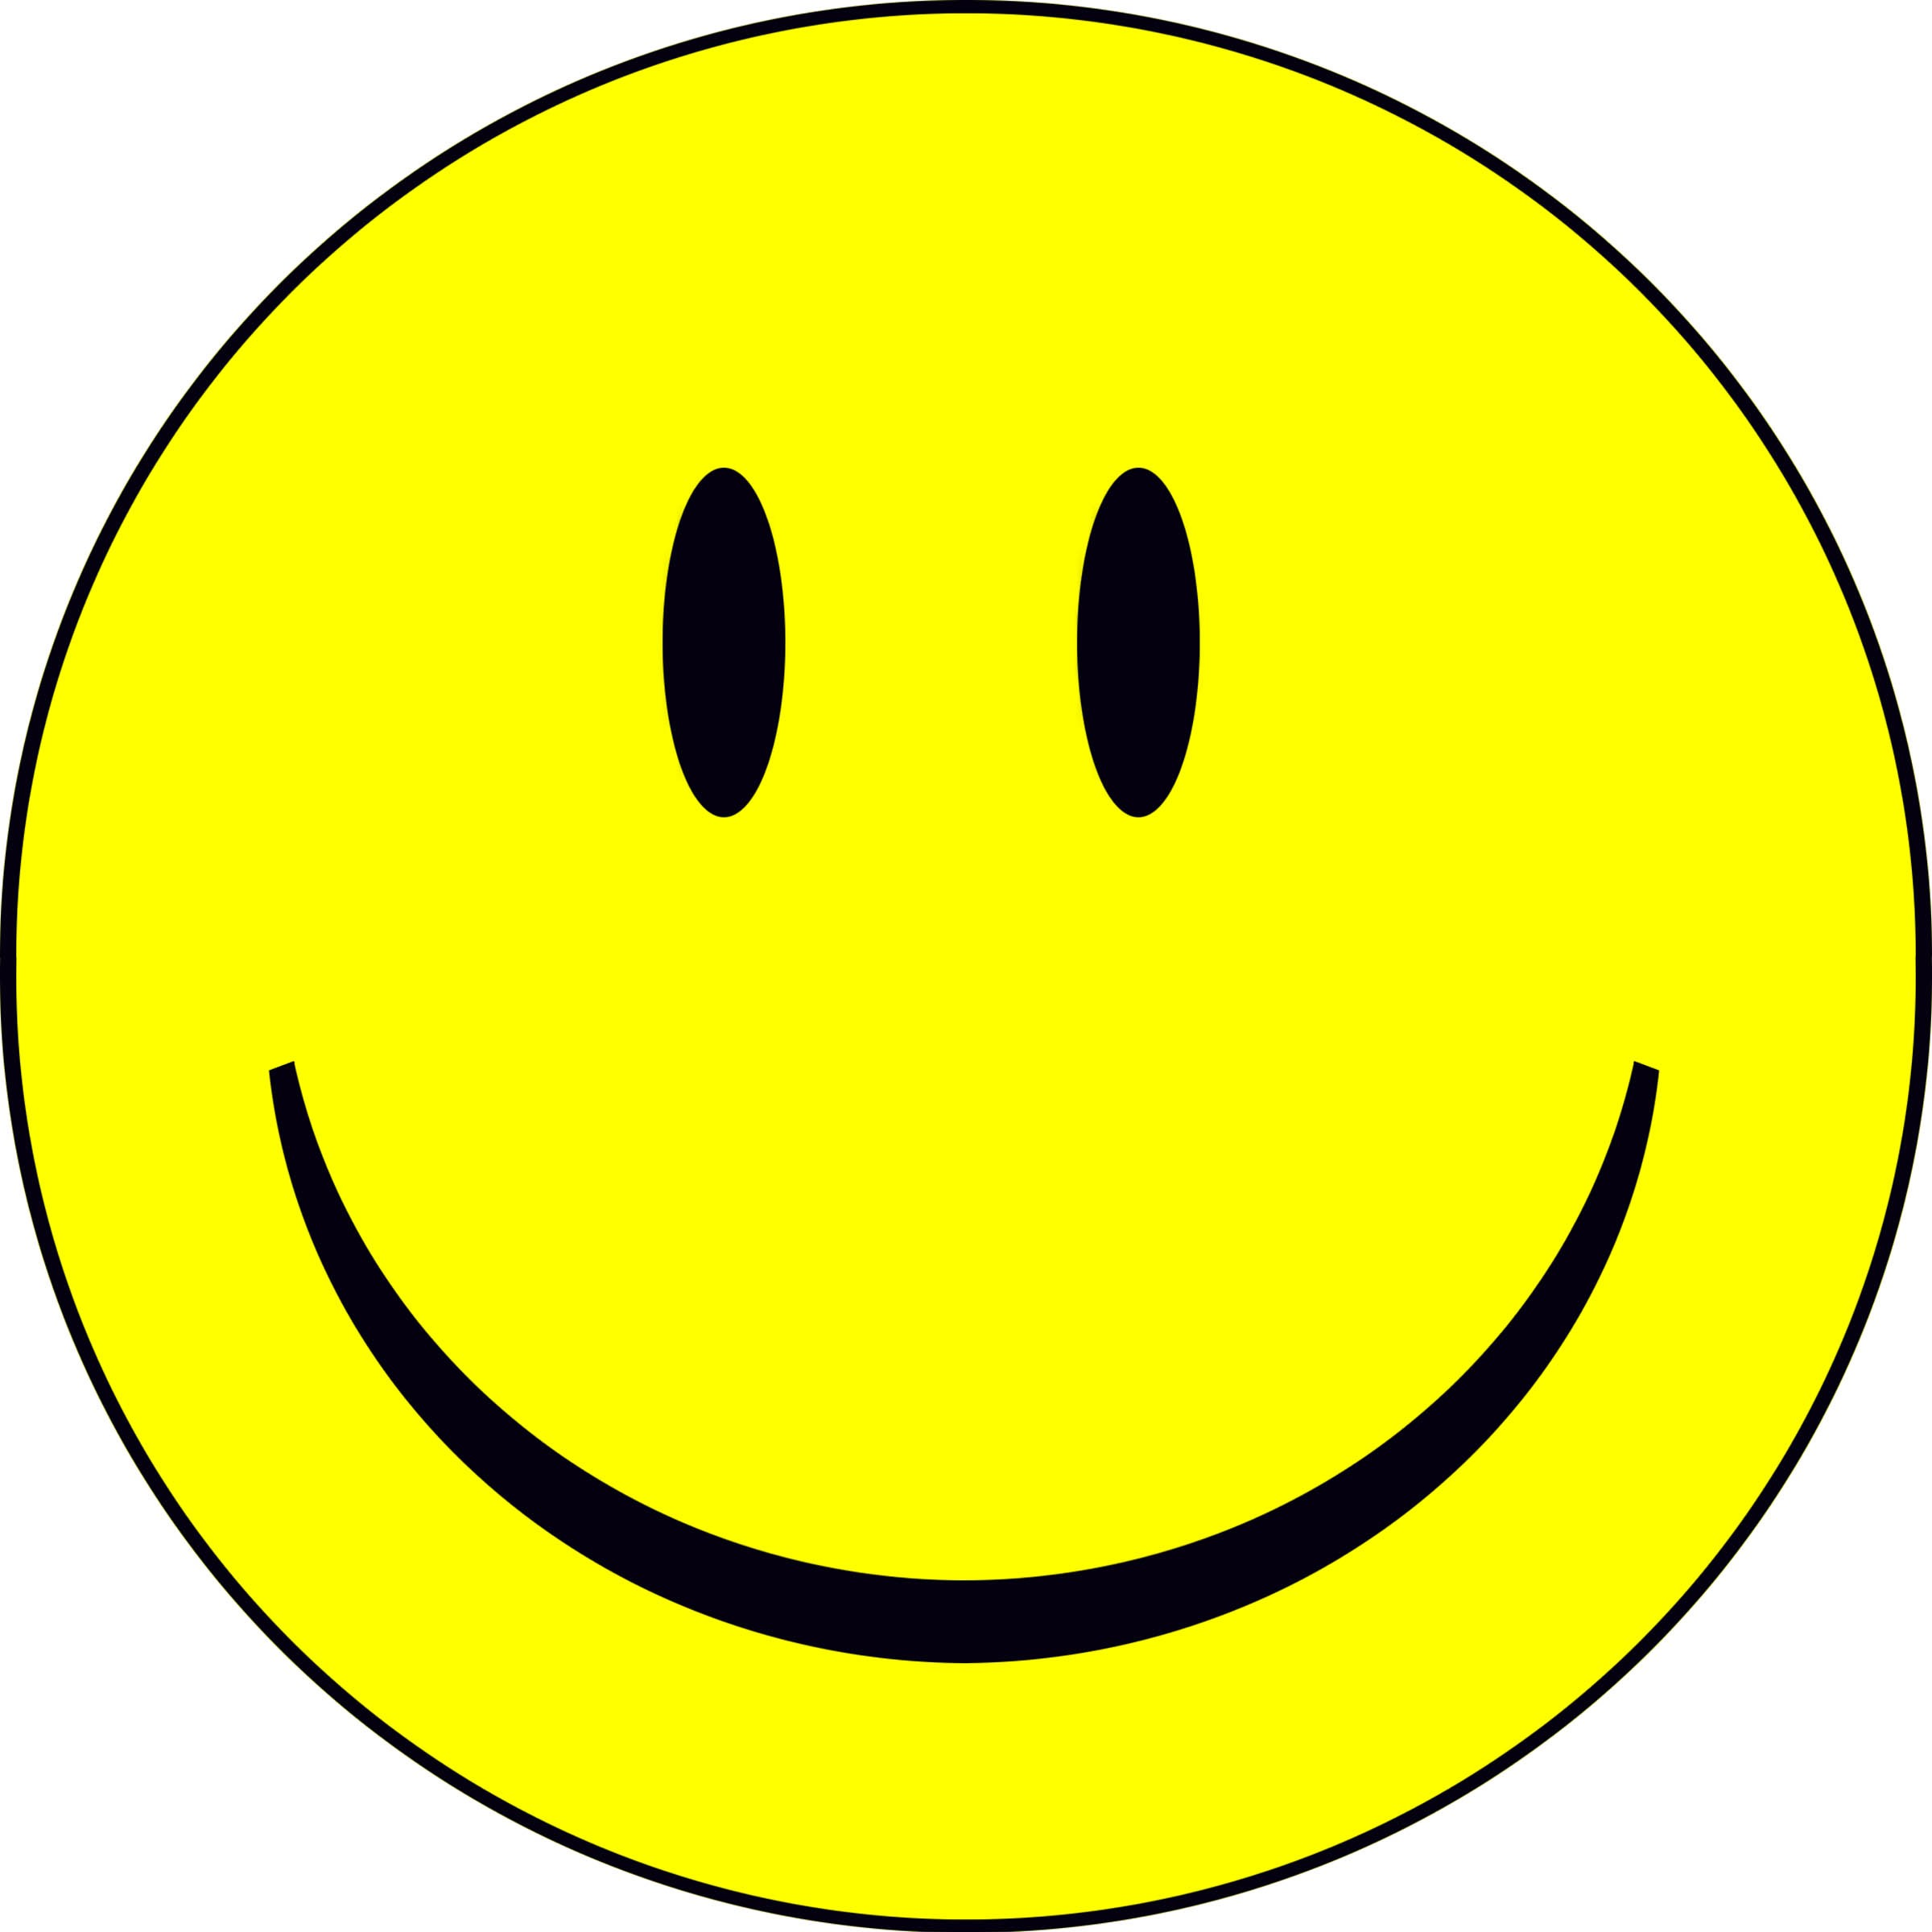 Smiley Happy Clipart #1 - Happy Clipart